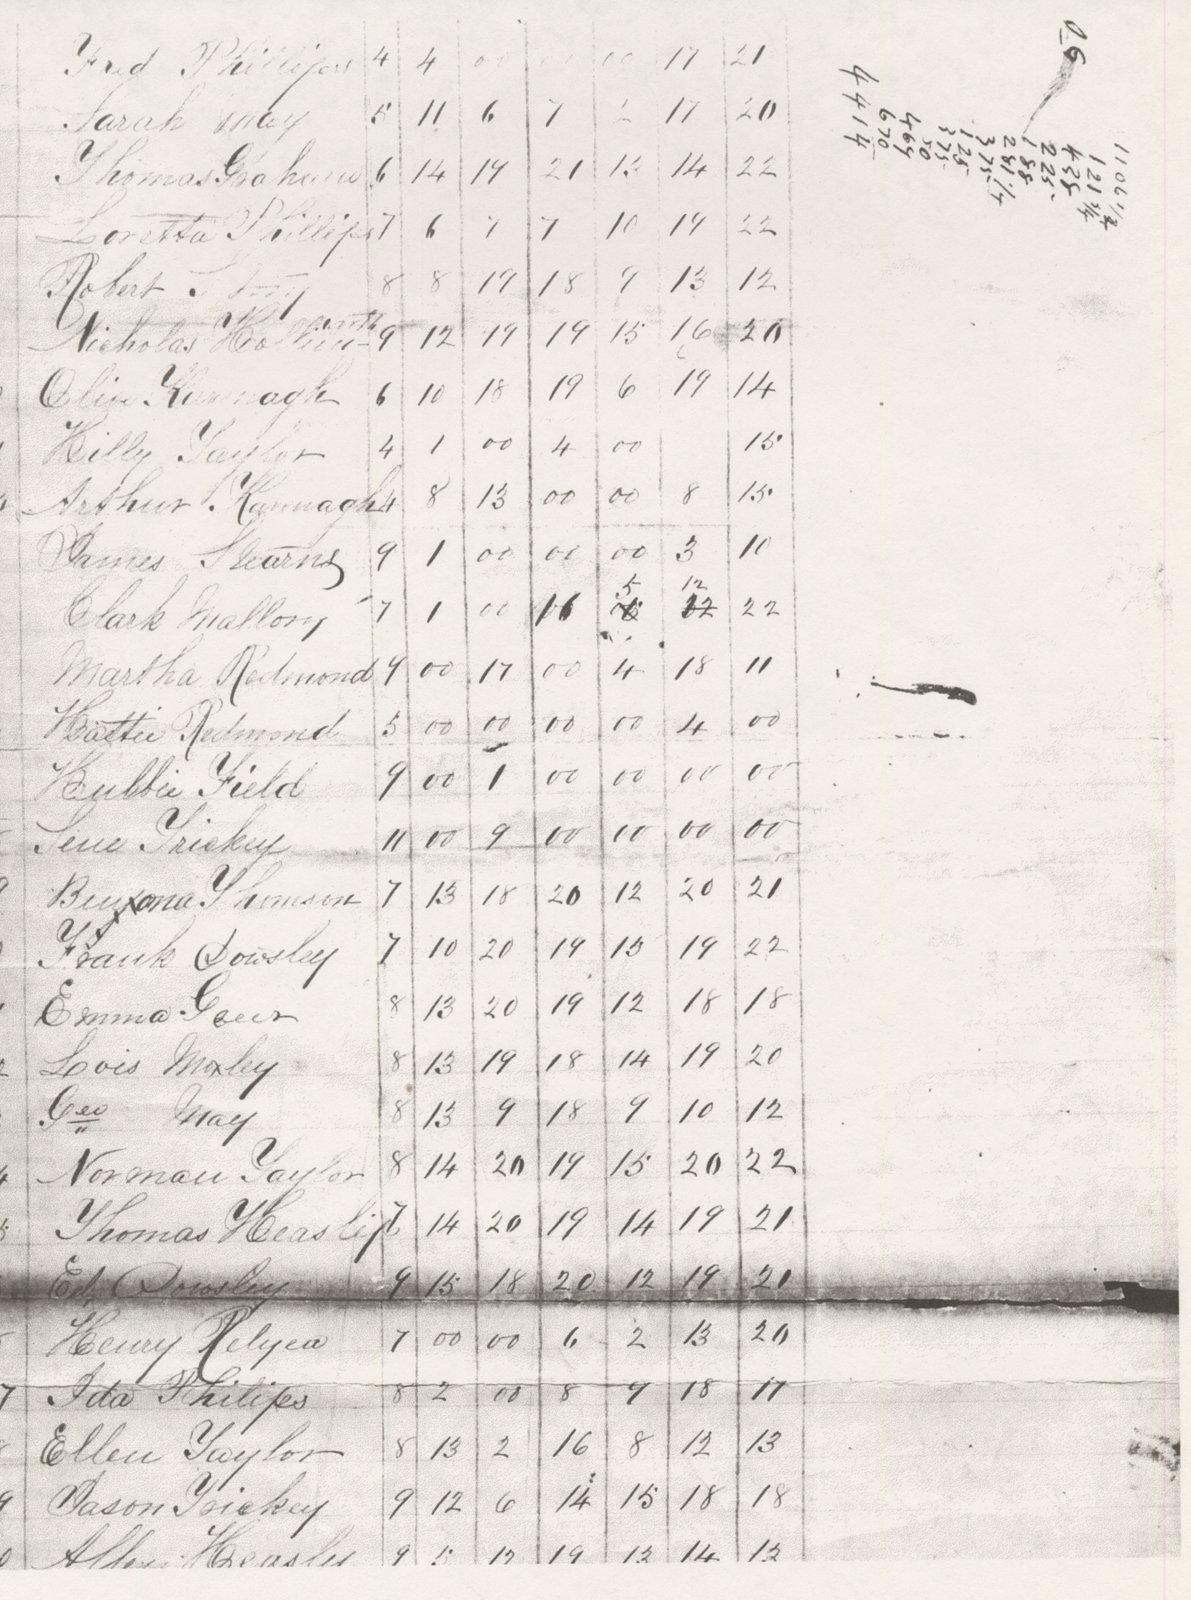 Escott SS #17 Register Page